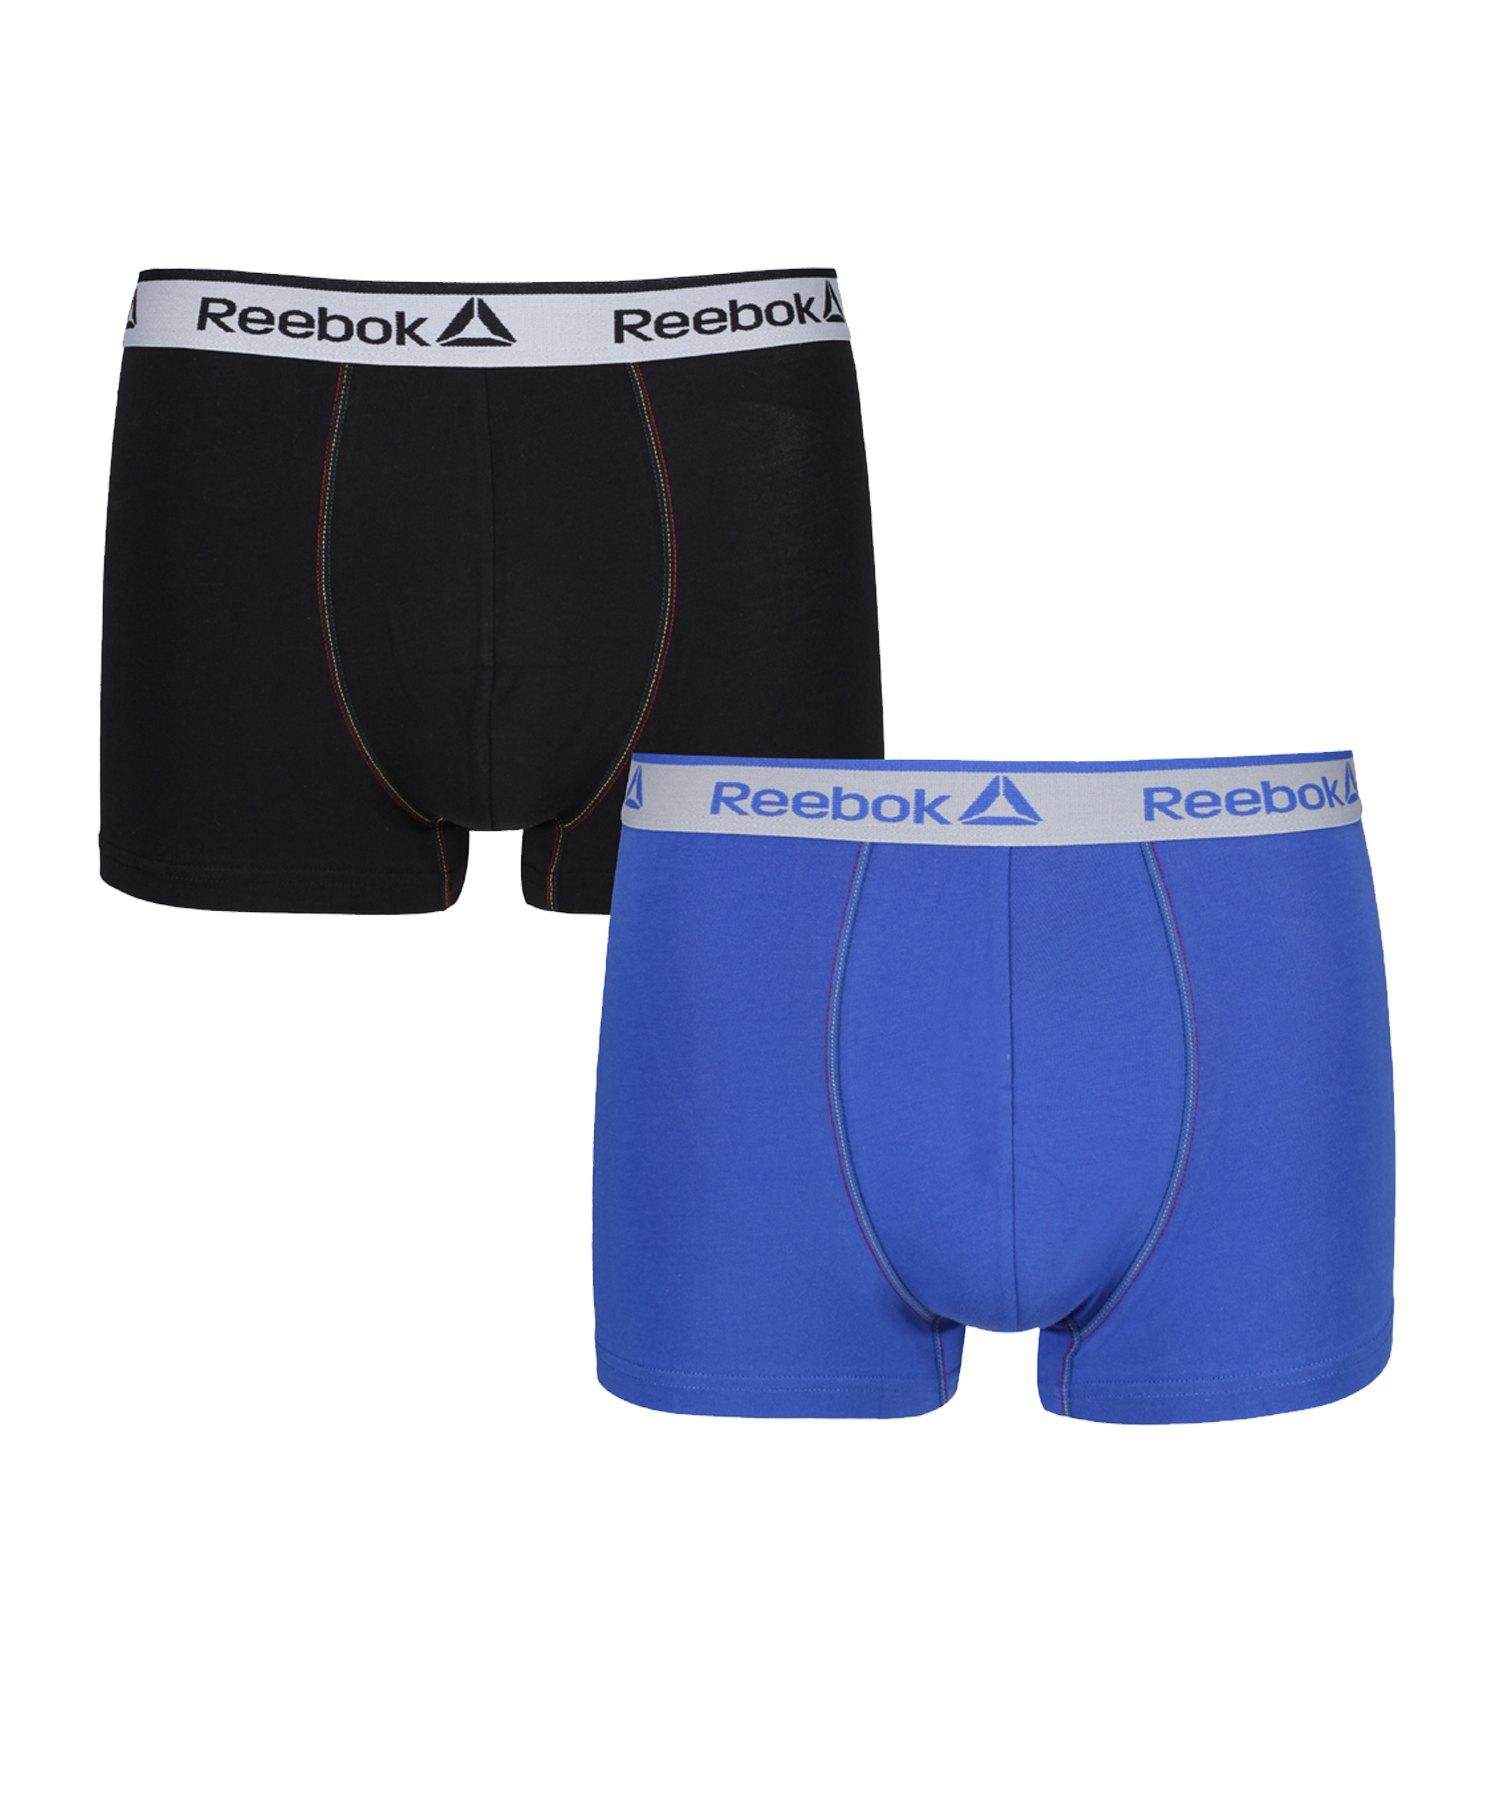 Reebok 2er Pack Trunk BILLY Boxershort Blau/Schwarz - blau